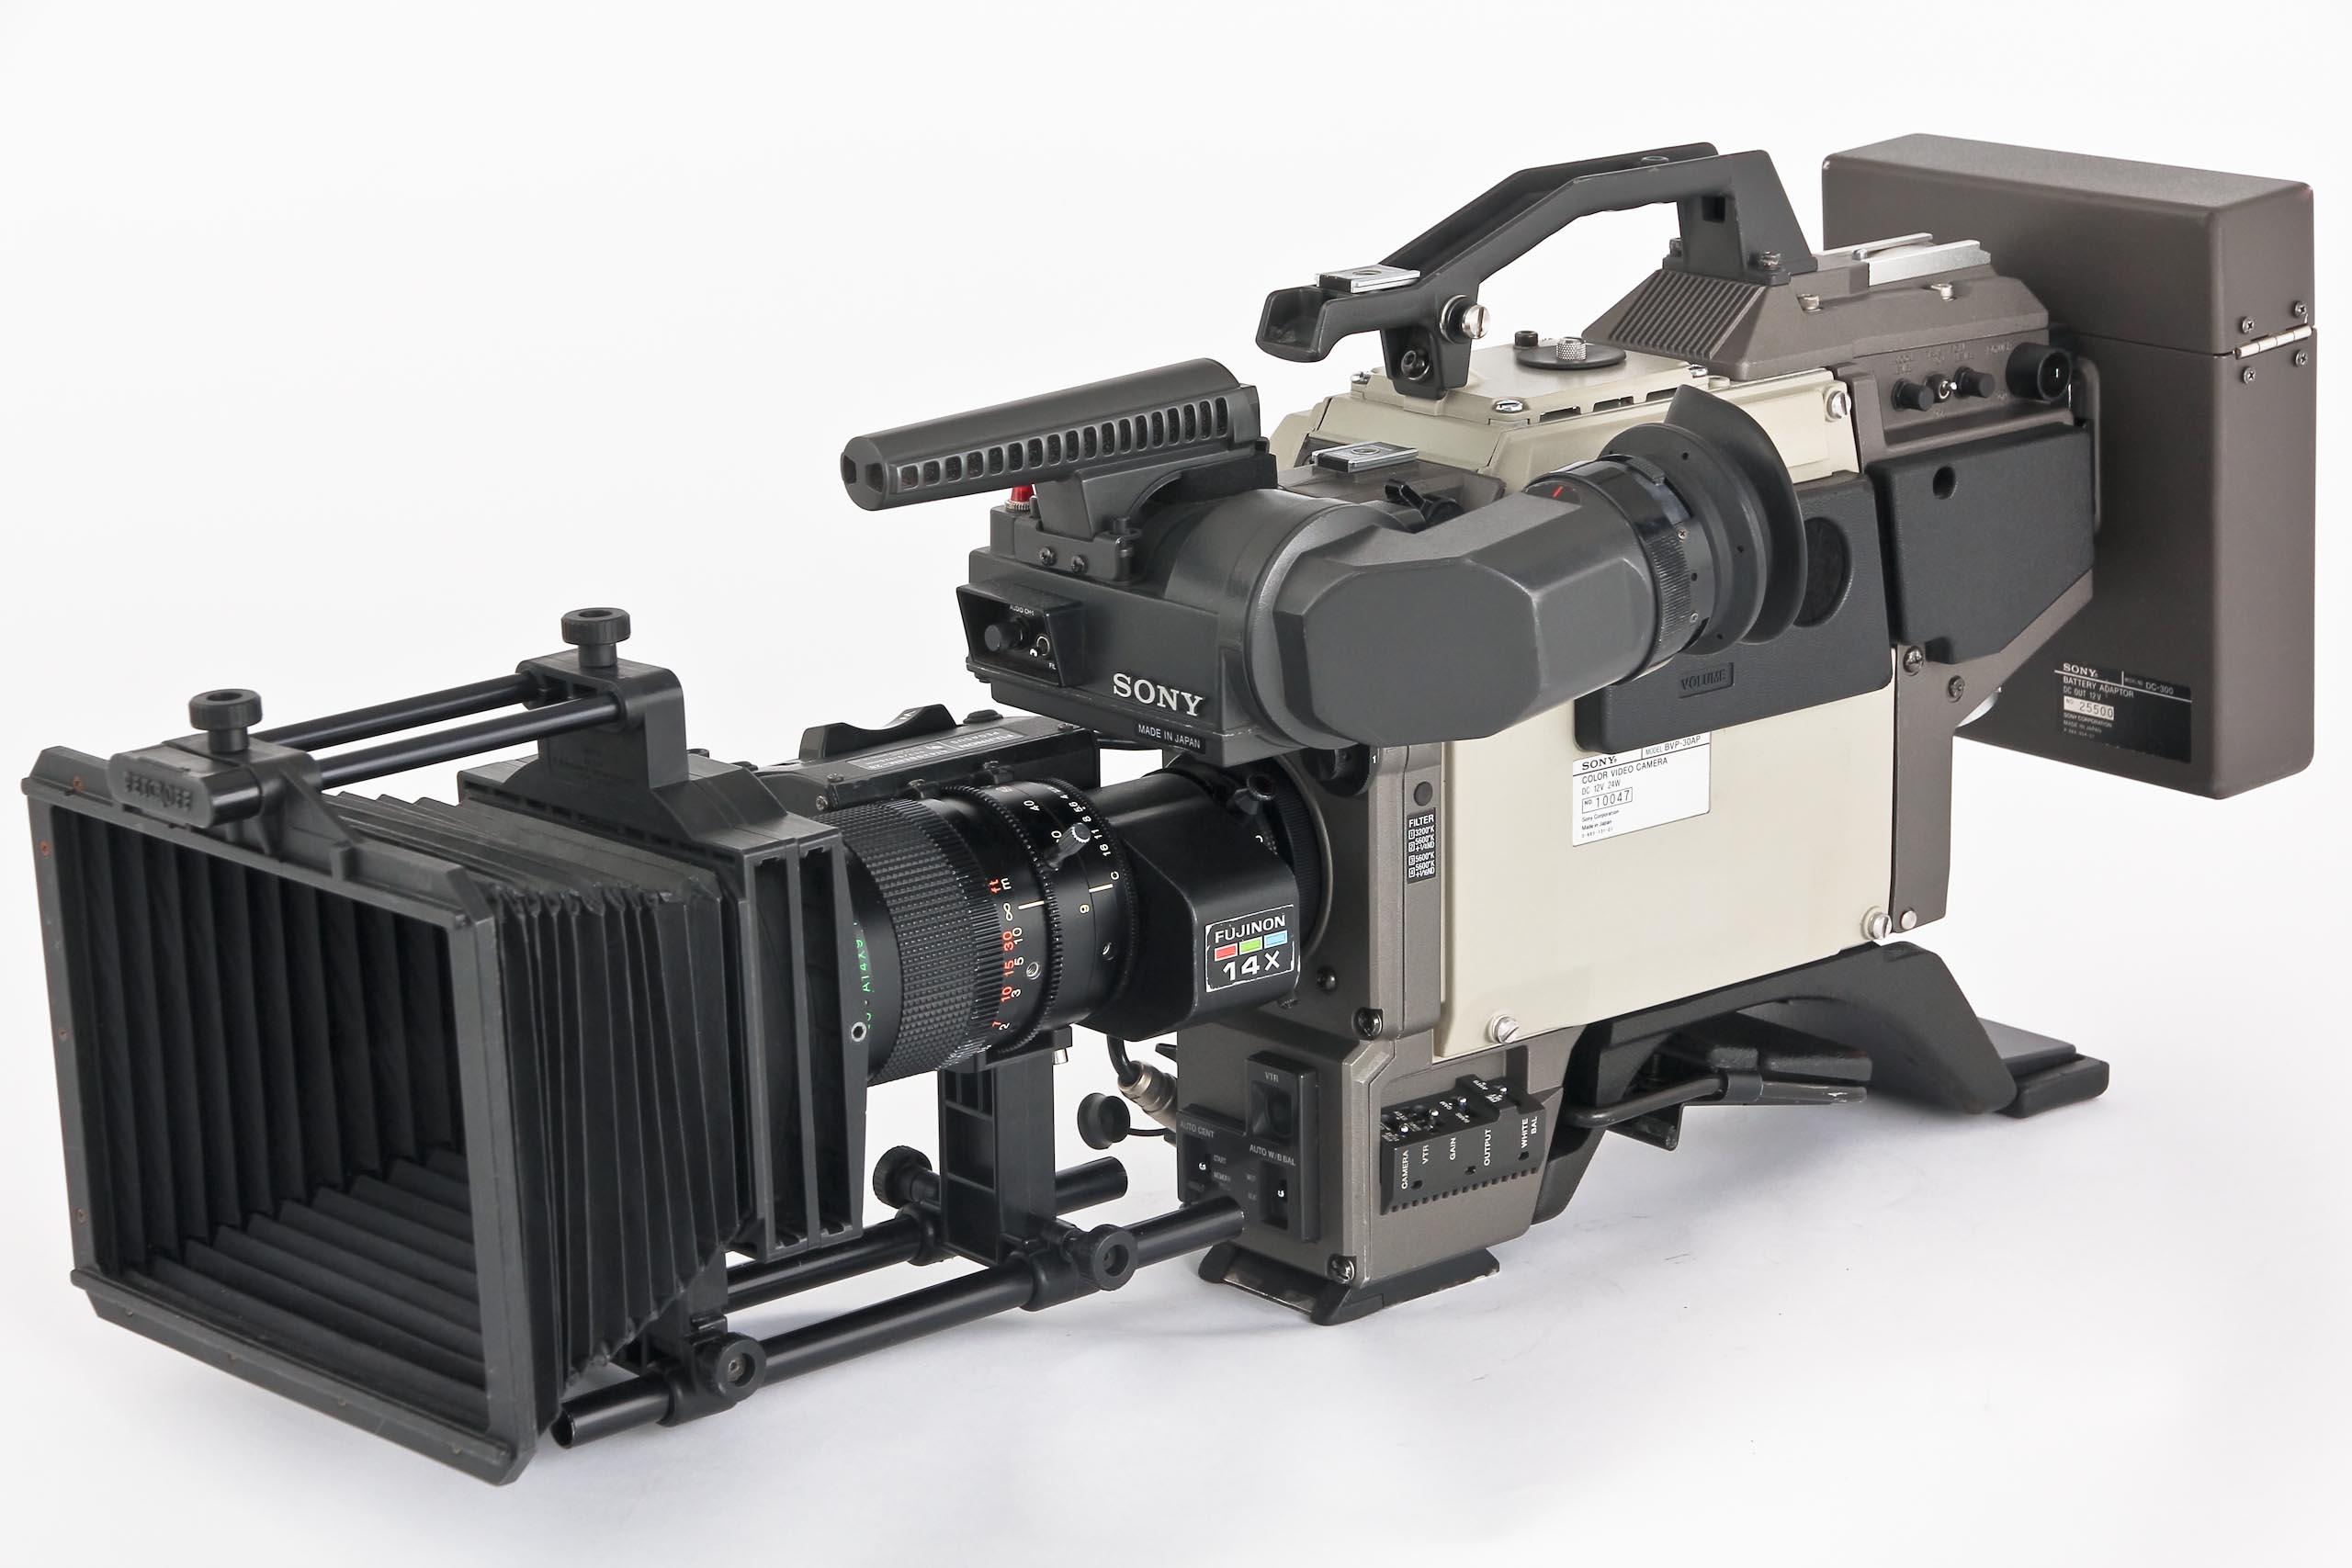 Sony BVP-30AP